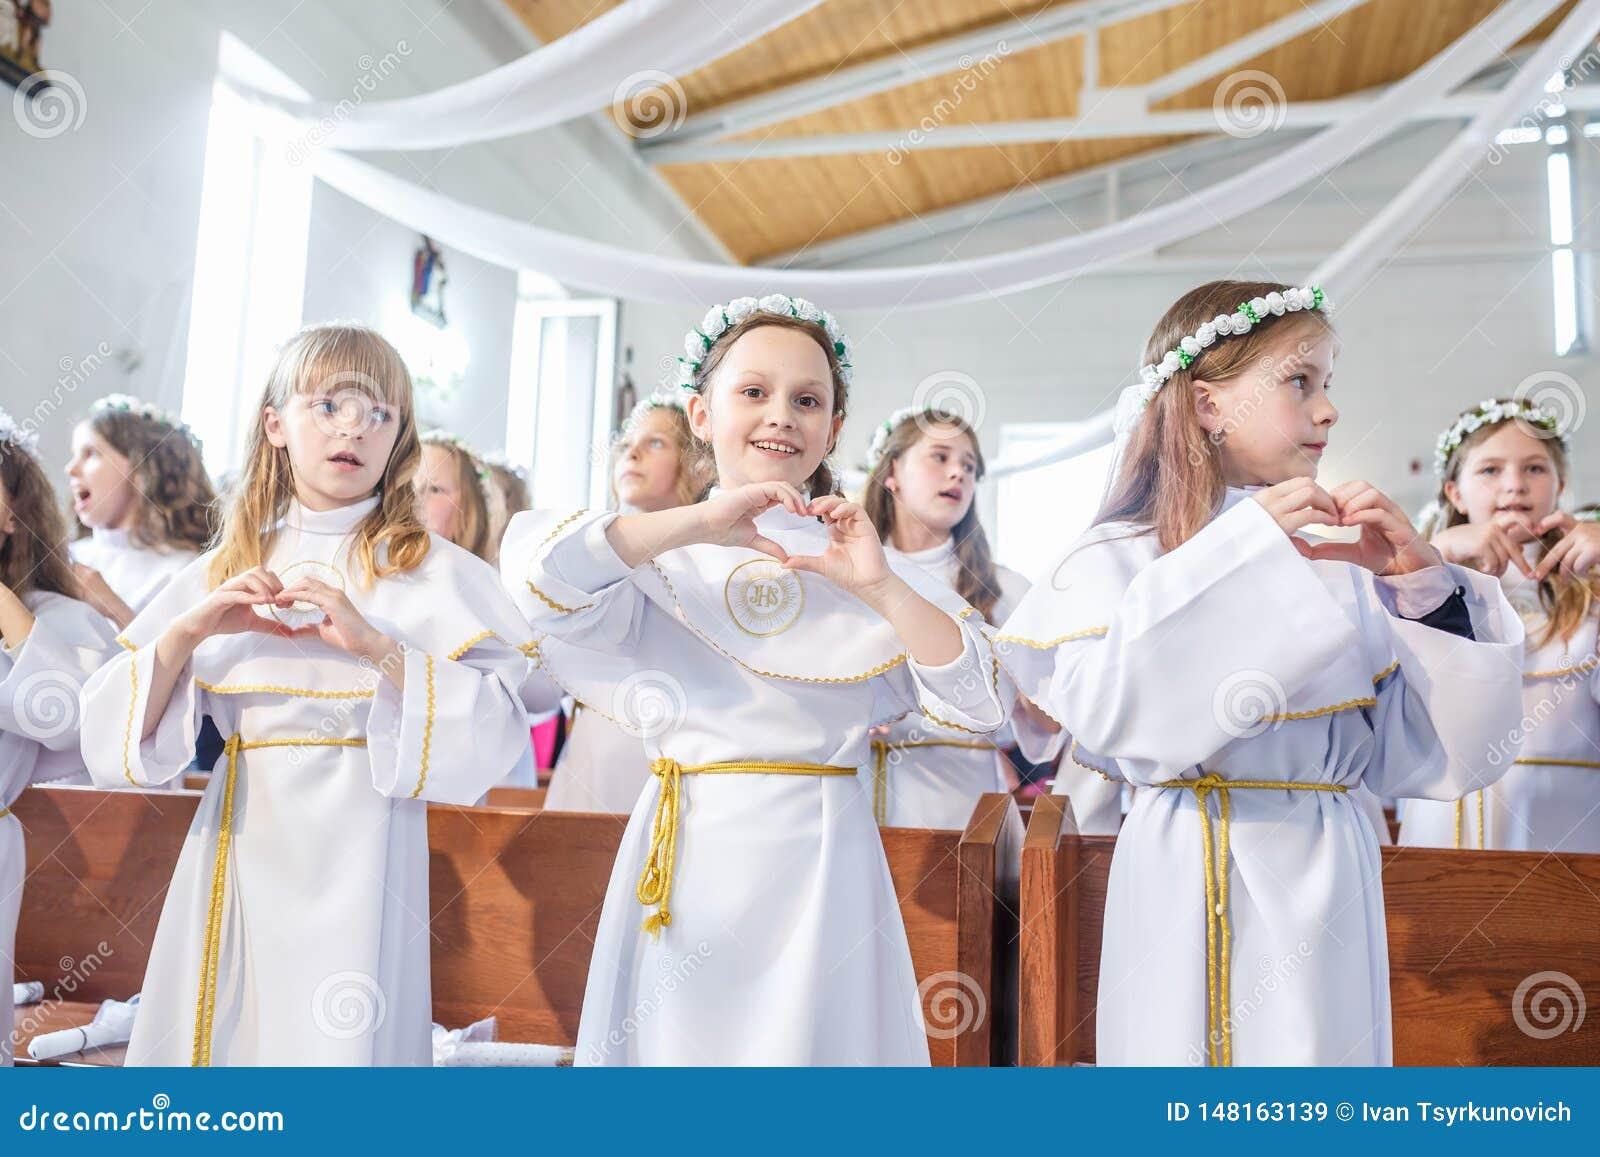 GRODNO, BIELORRUSIA - MAYO DE 2019: Los ni?os jovenes en la iglesia cat?lica est?n esperando la primera comuni?n del eucharist Po